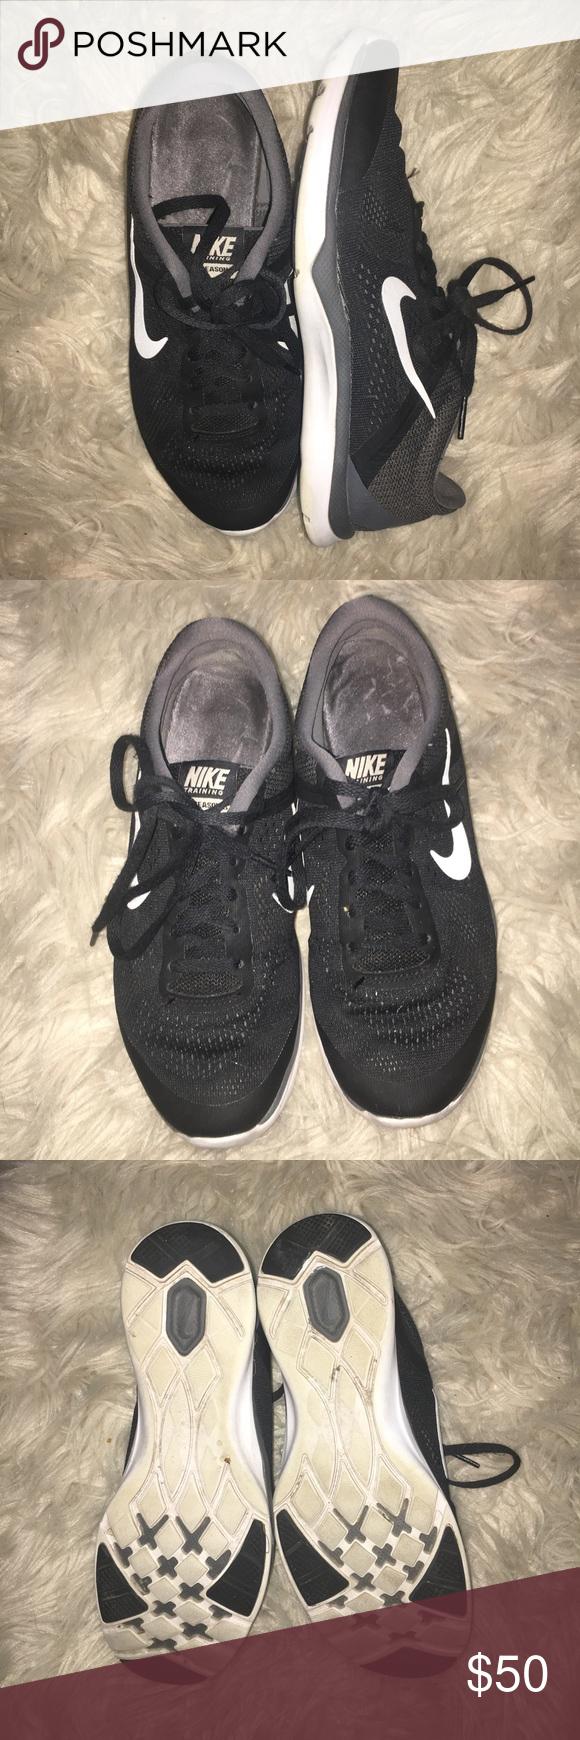 Nike training in season 5 sneakers Smoke free, Smoking and Shoes